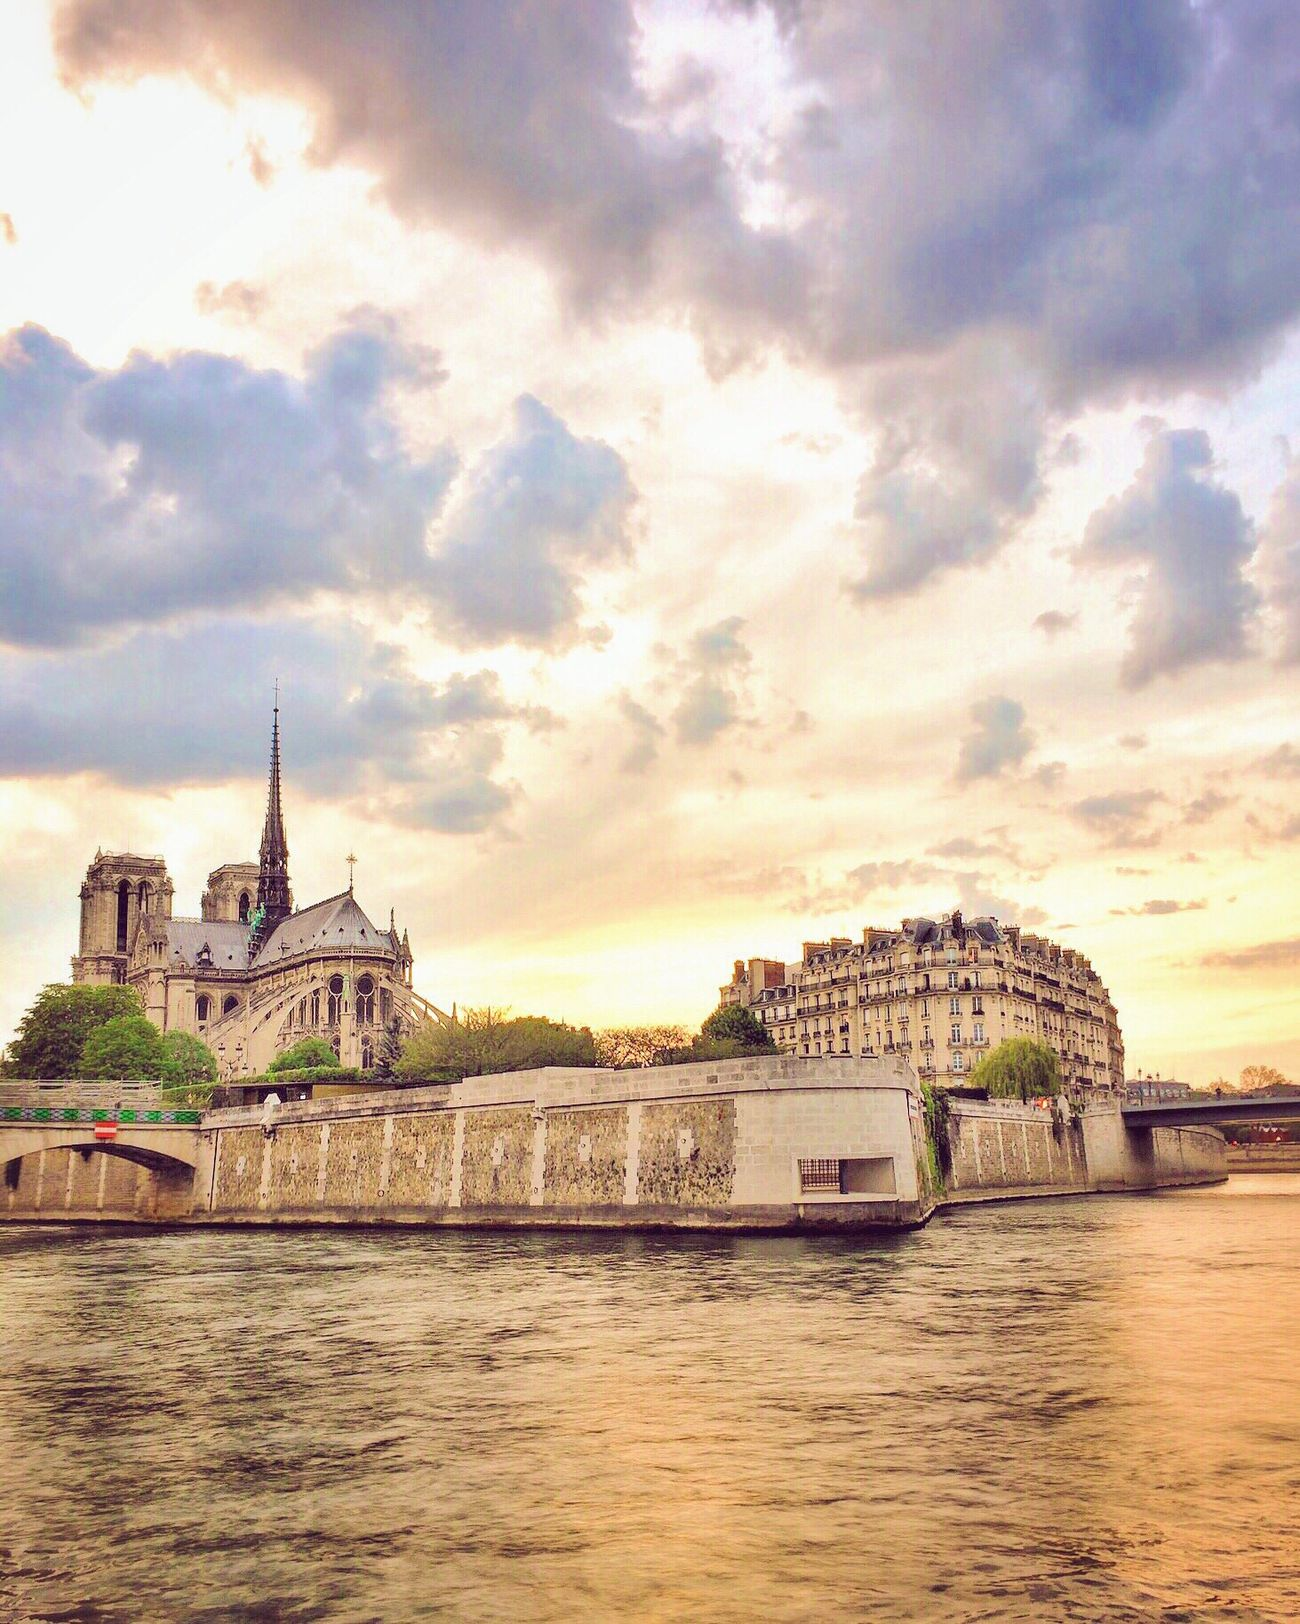 Dreaming of warmer days! Bonsoir Paris! Cloud - Sky Sunset Water River Photooftheday Parisweloveyou Paris EyeEm Best Shots Eyem Best Shot - Architecture Sunset_collection Travel Destinations